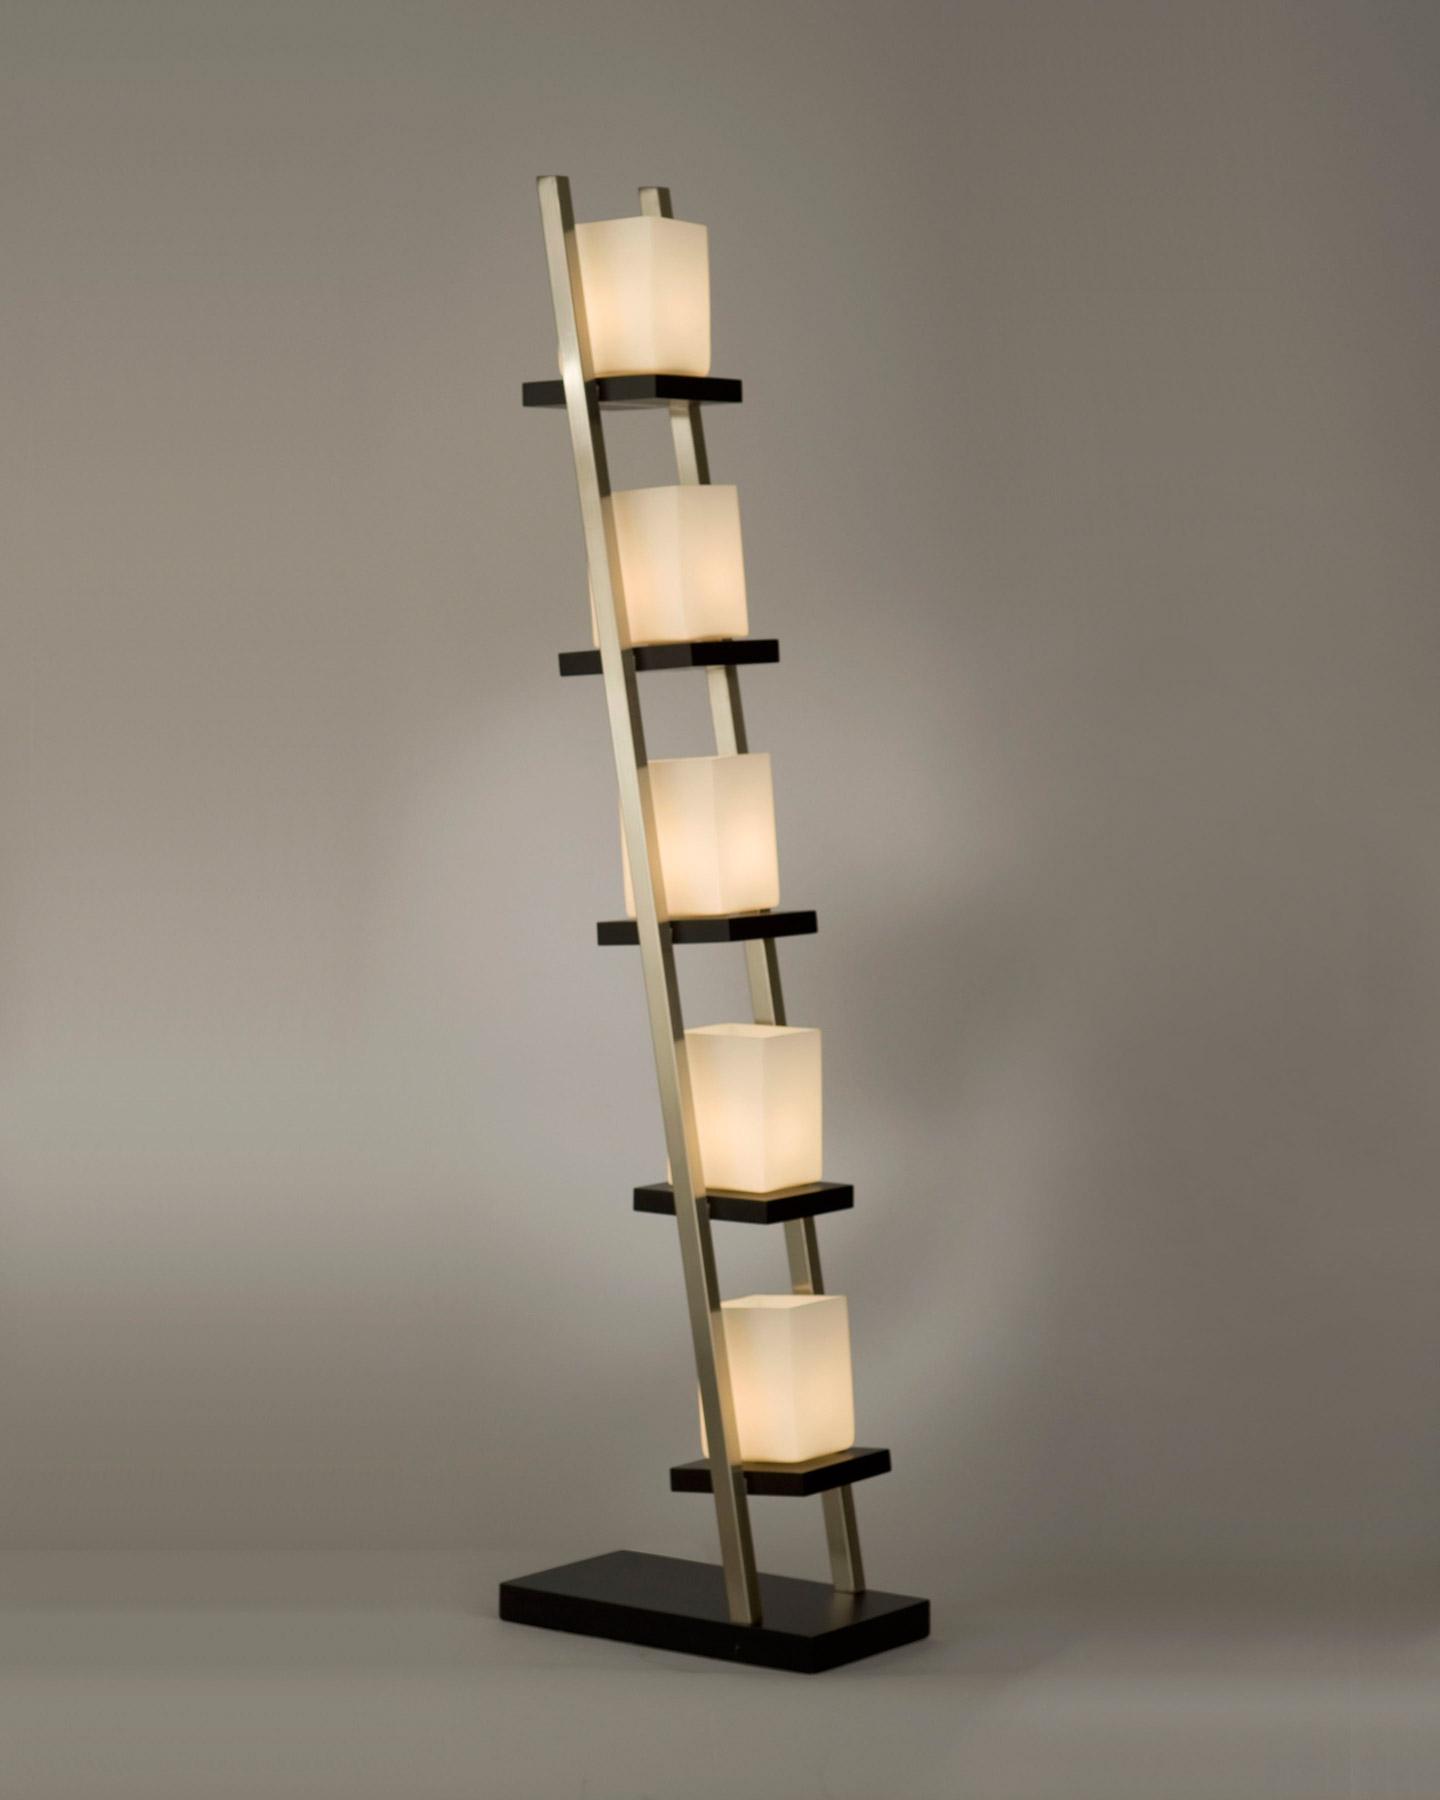 Nova Lighting 11815 Escalier Floor Lamp